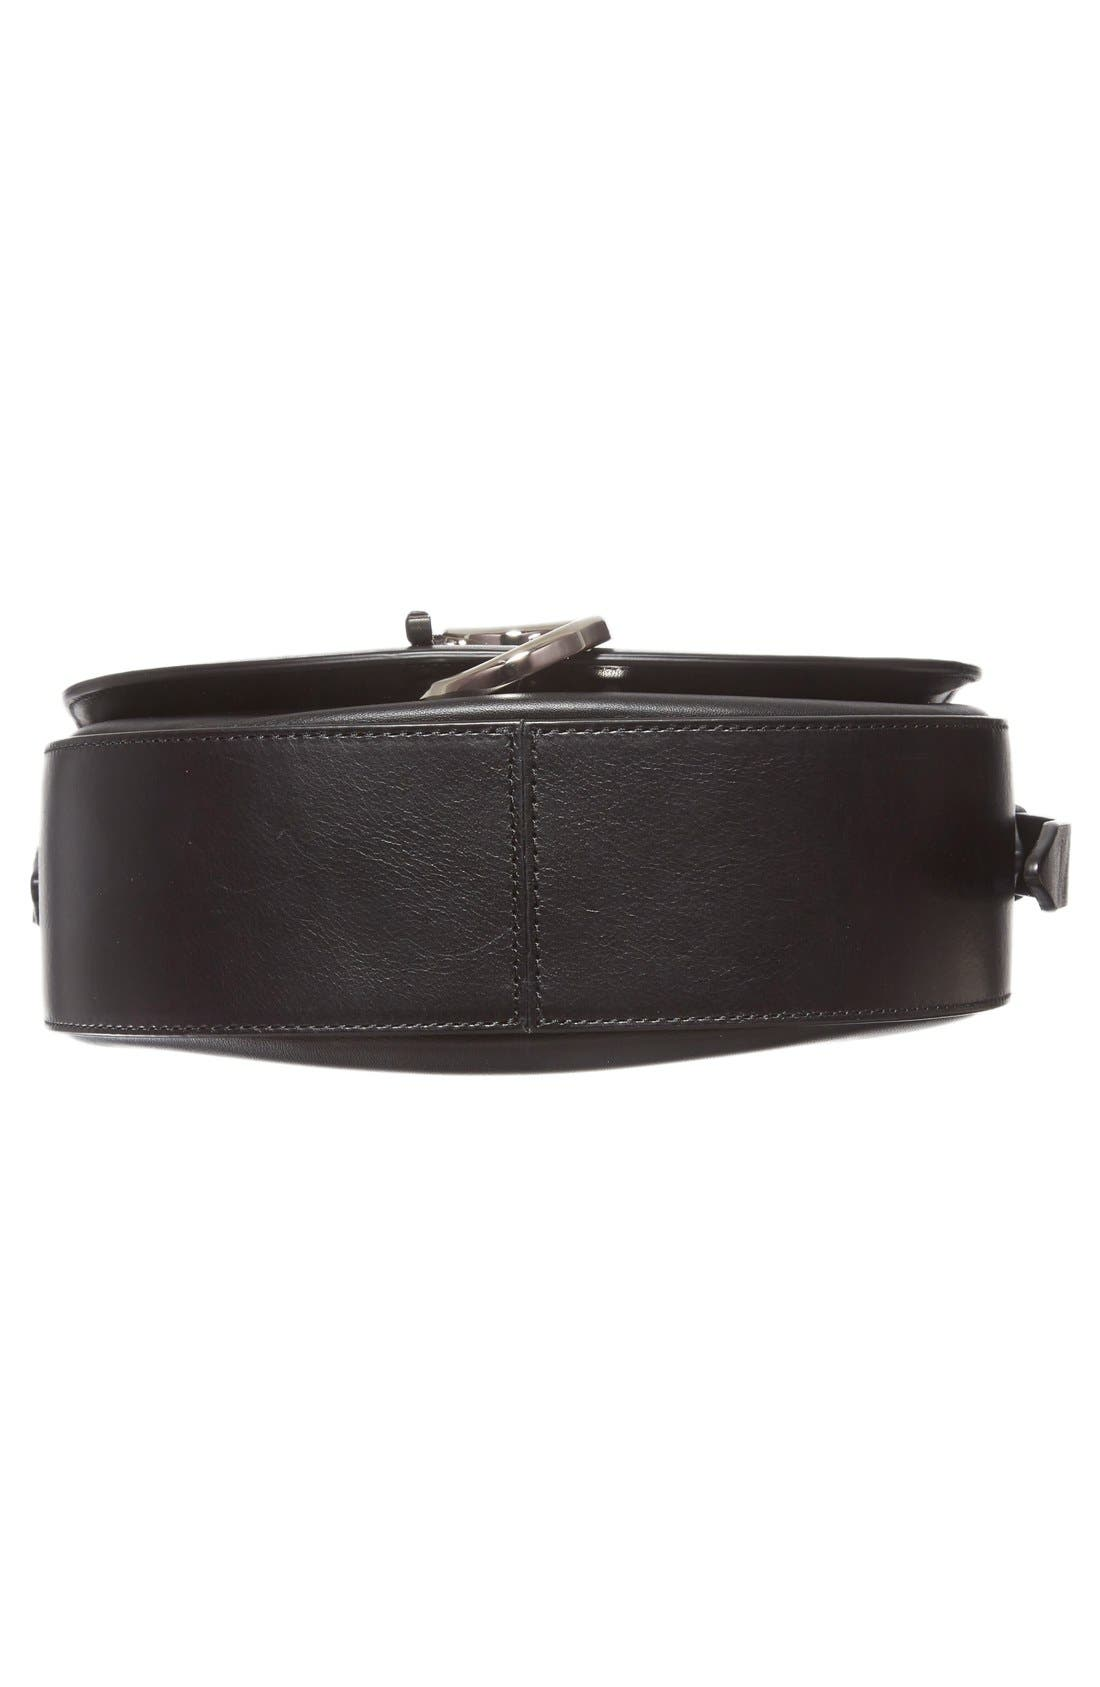 Alix Leather Saddle Bag,                             Alternate thumbnail 16, color,